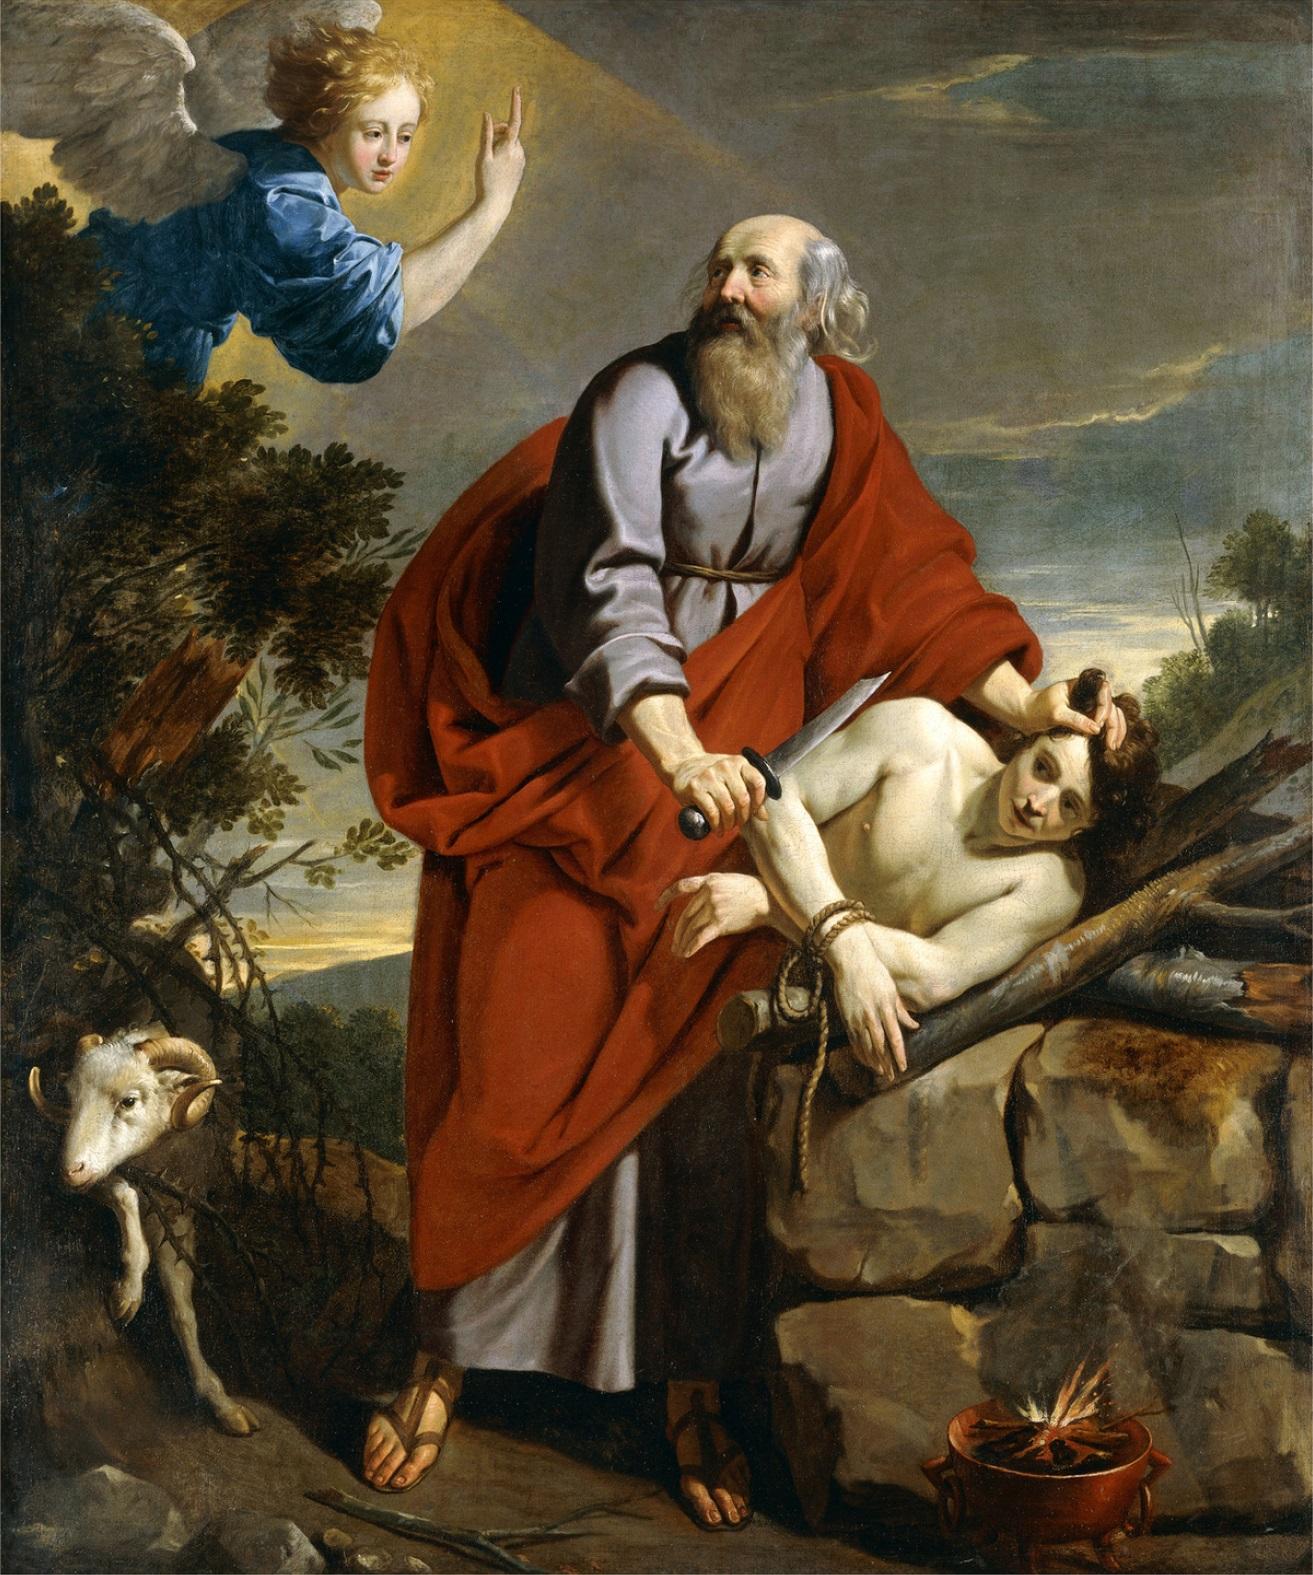 File:Philippe de Champaigne - Le sacrifice d'Isaac.jpg - Wikimedia Commons